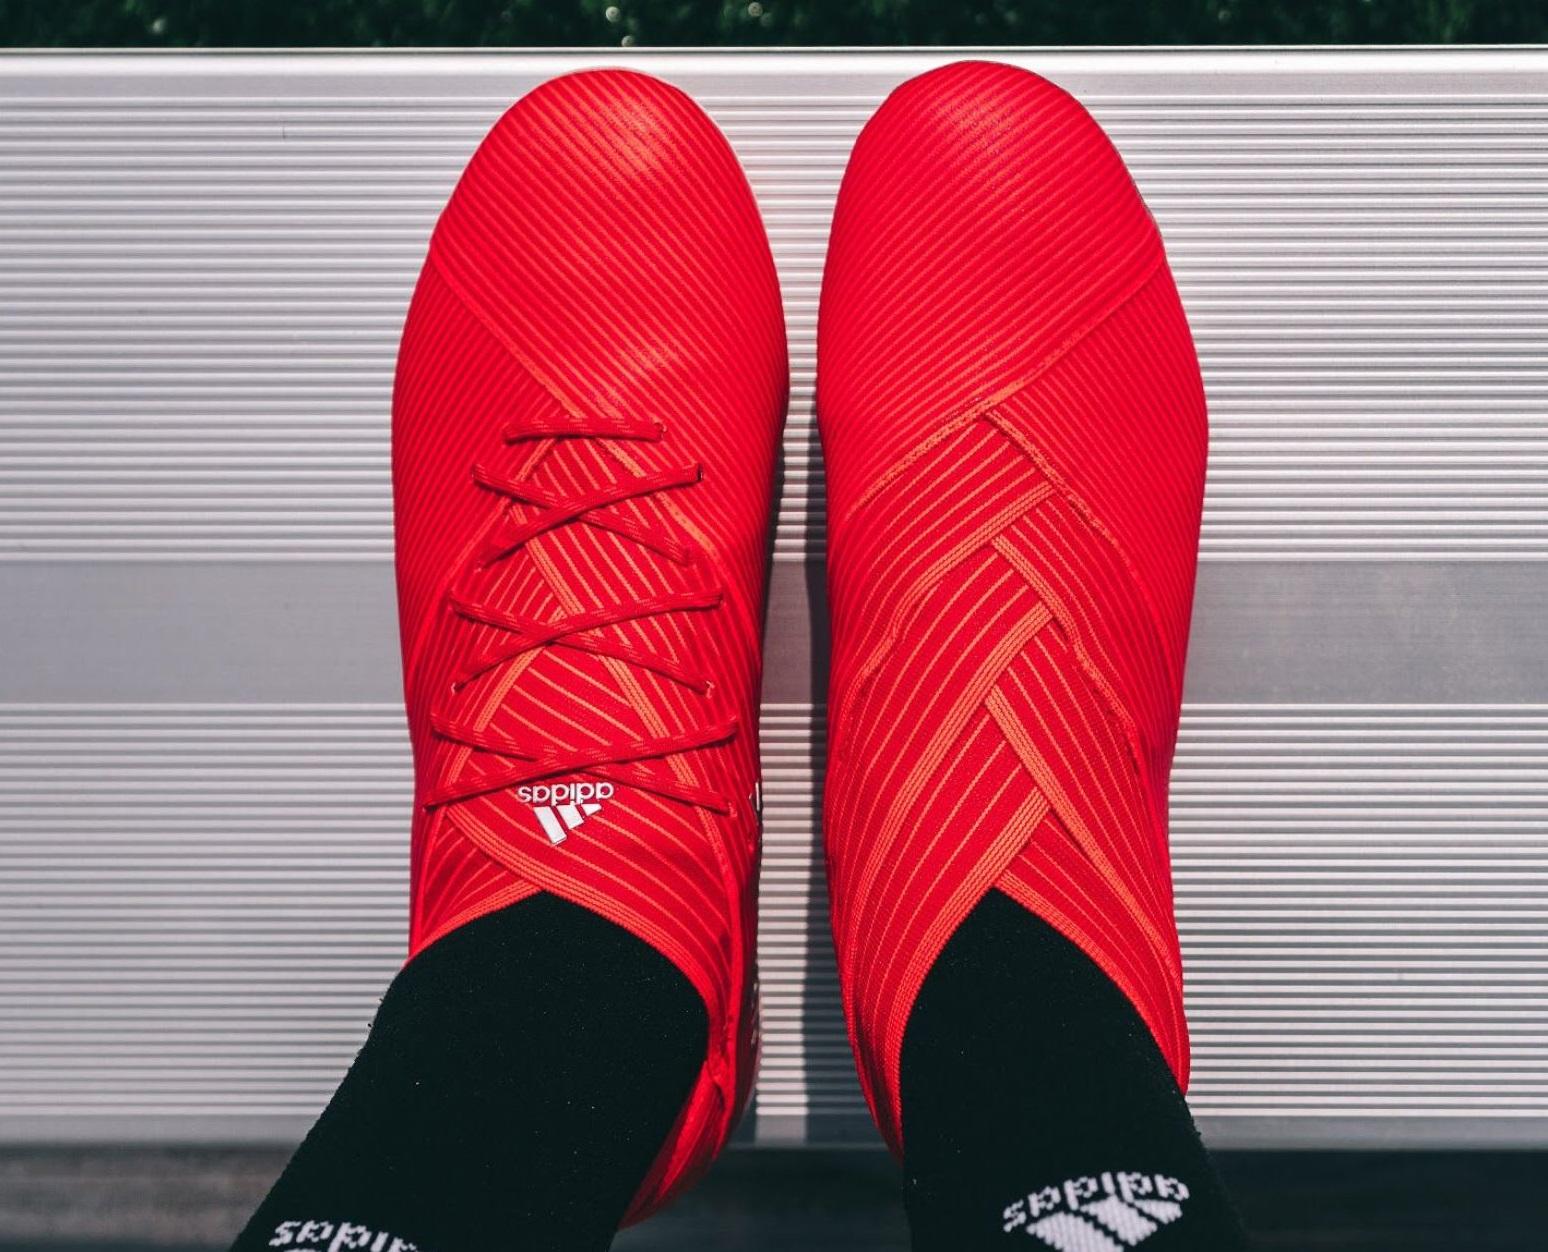 e8818cba0 adidas Nemeziz19 Laced Laceless. Share. Facebook · Twitter · Google + ·  Pinterest. Tags adidas Nemeziz 19 Lionel Messi New Release